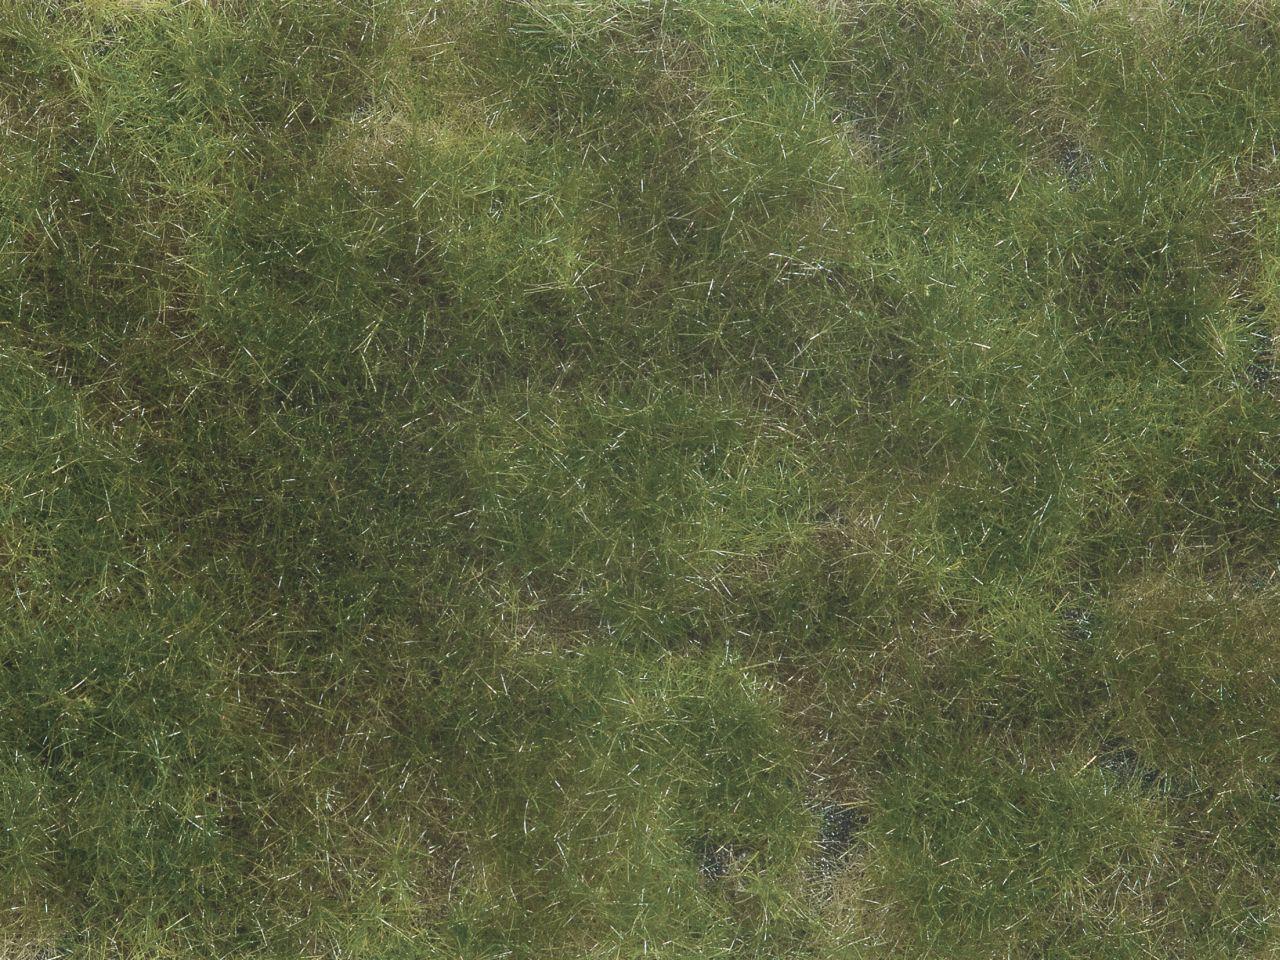 Bodend.-Foliage olivgrün